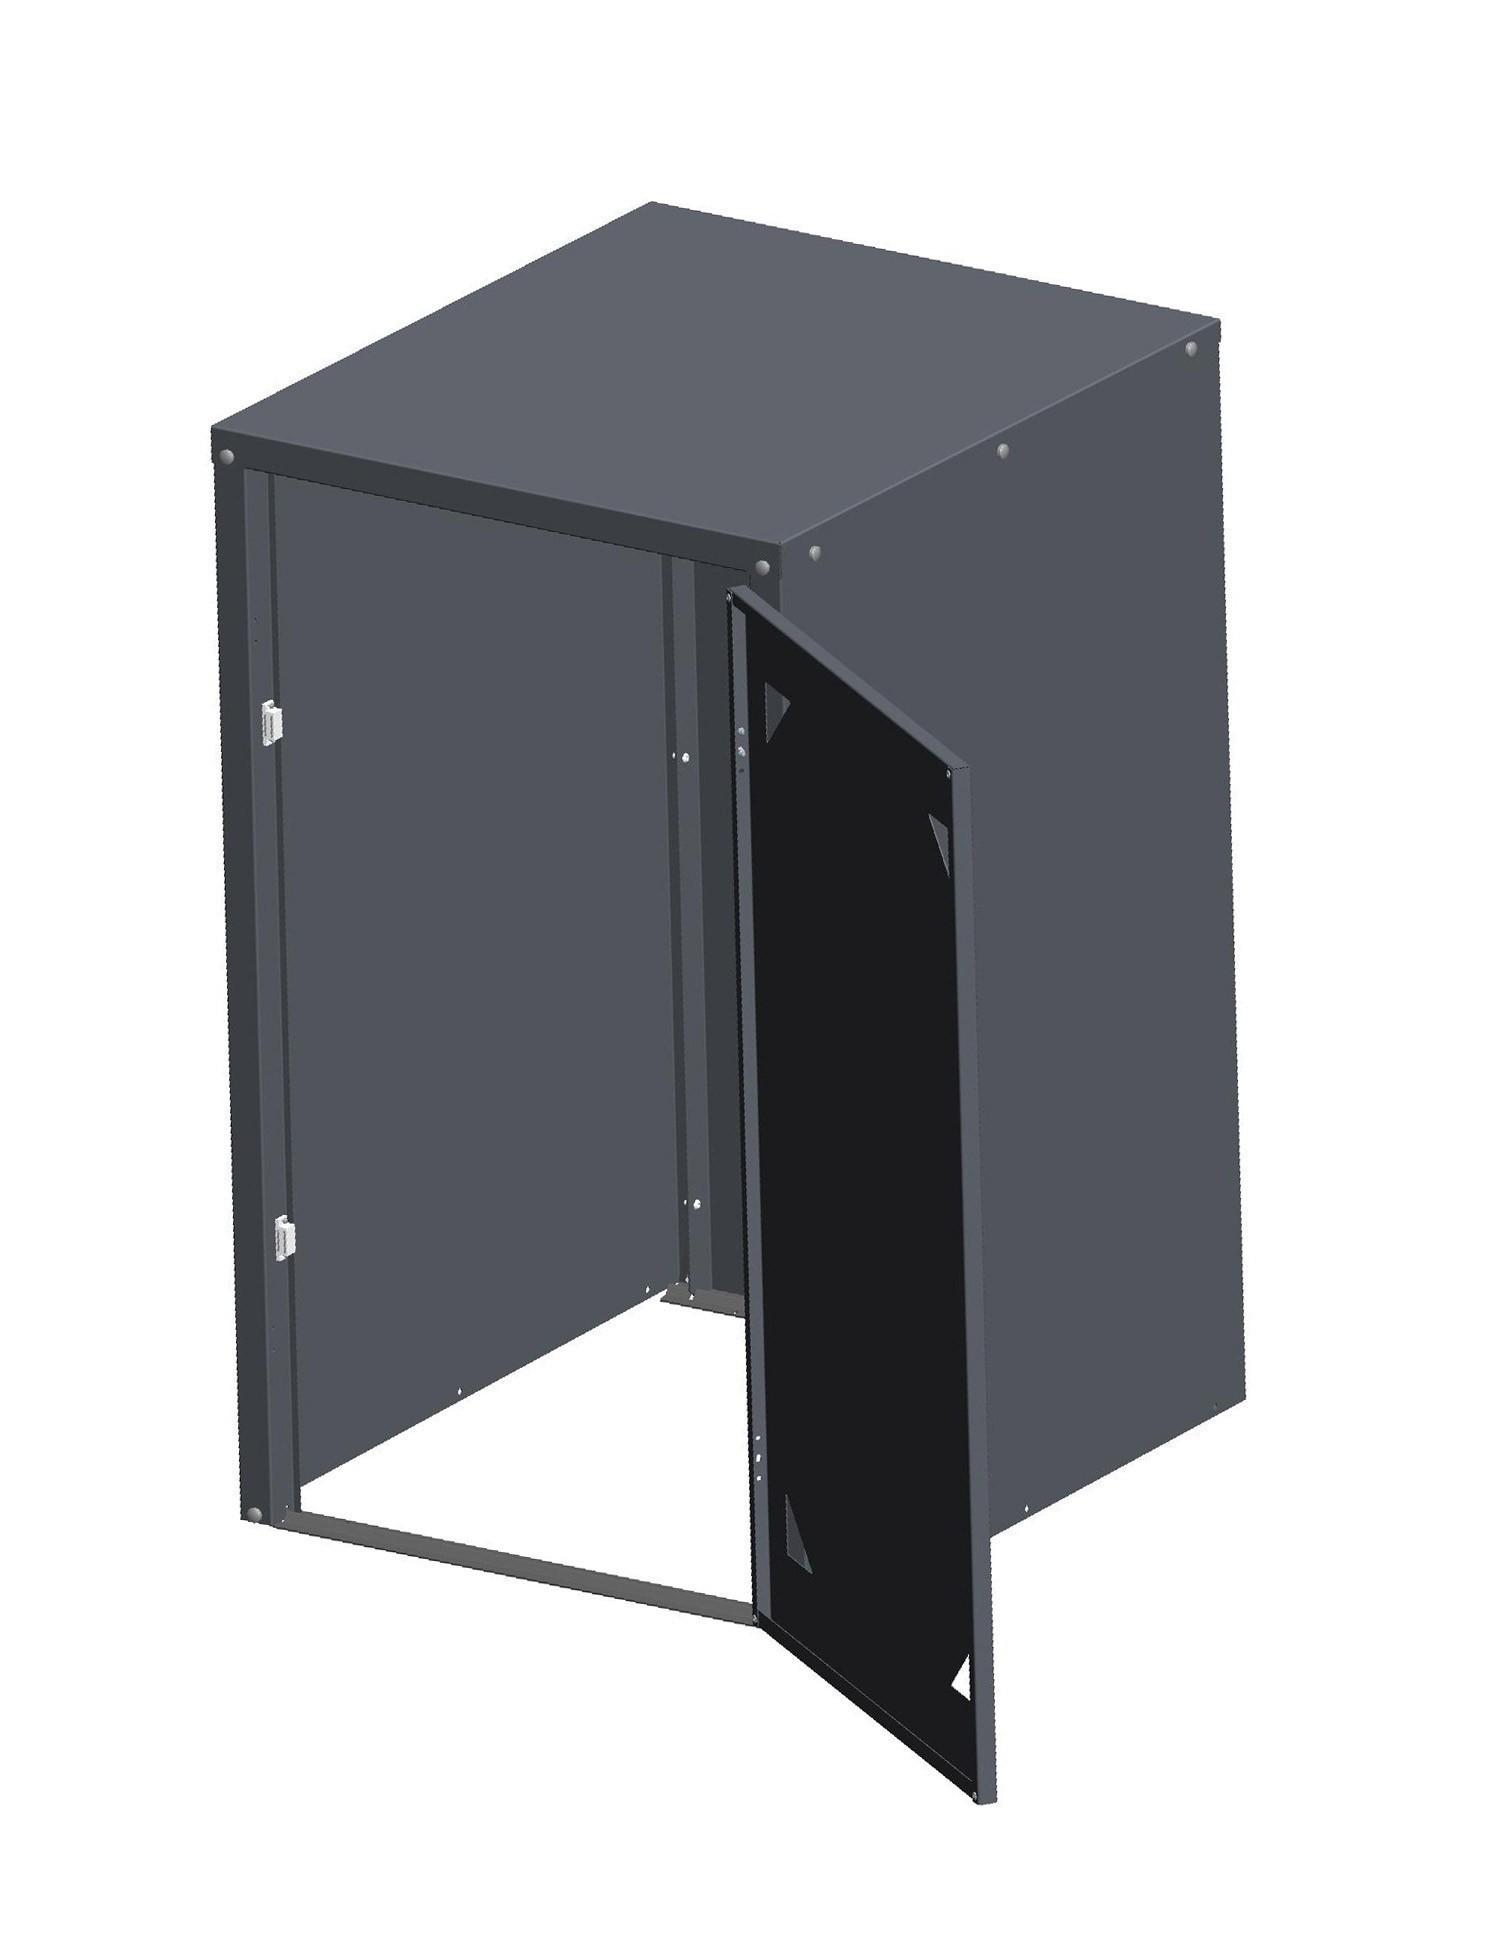 Universalbox / Mülltonnenbox Metall anthrazit 71x82x120cm Bild 2